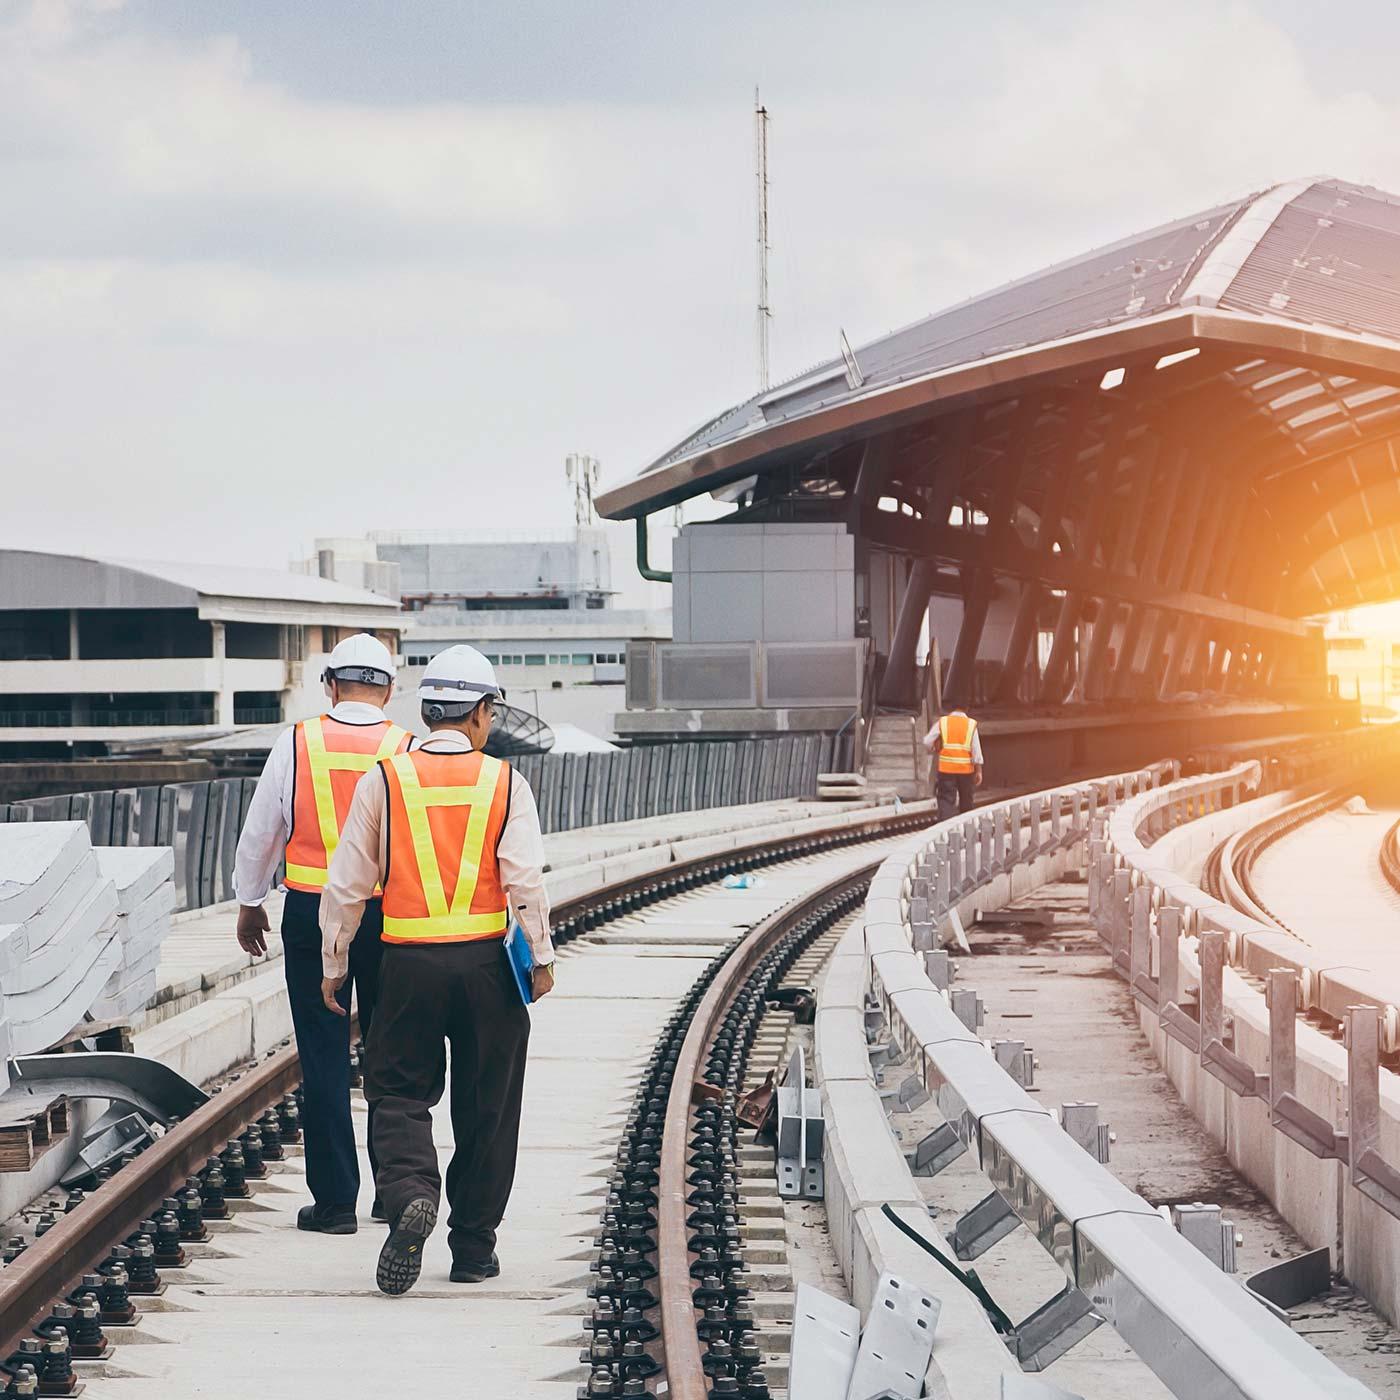 vuolo-group-train-manufacturers-railway-maintenance-operations_1